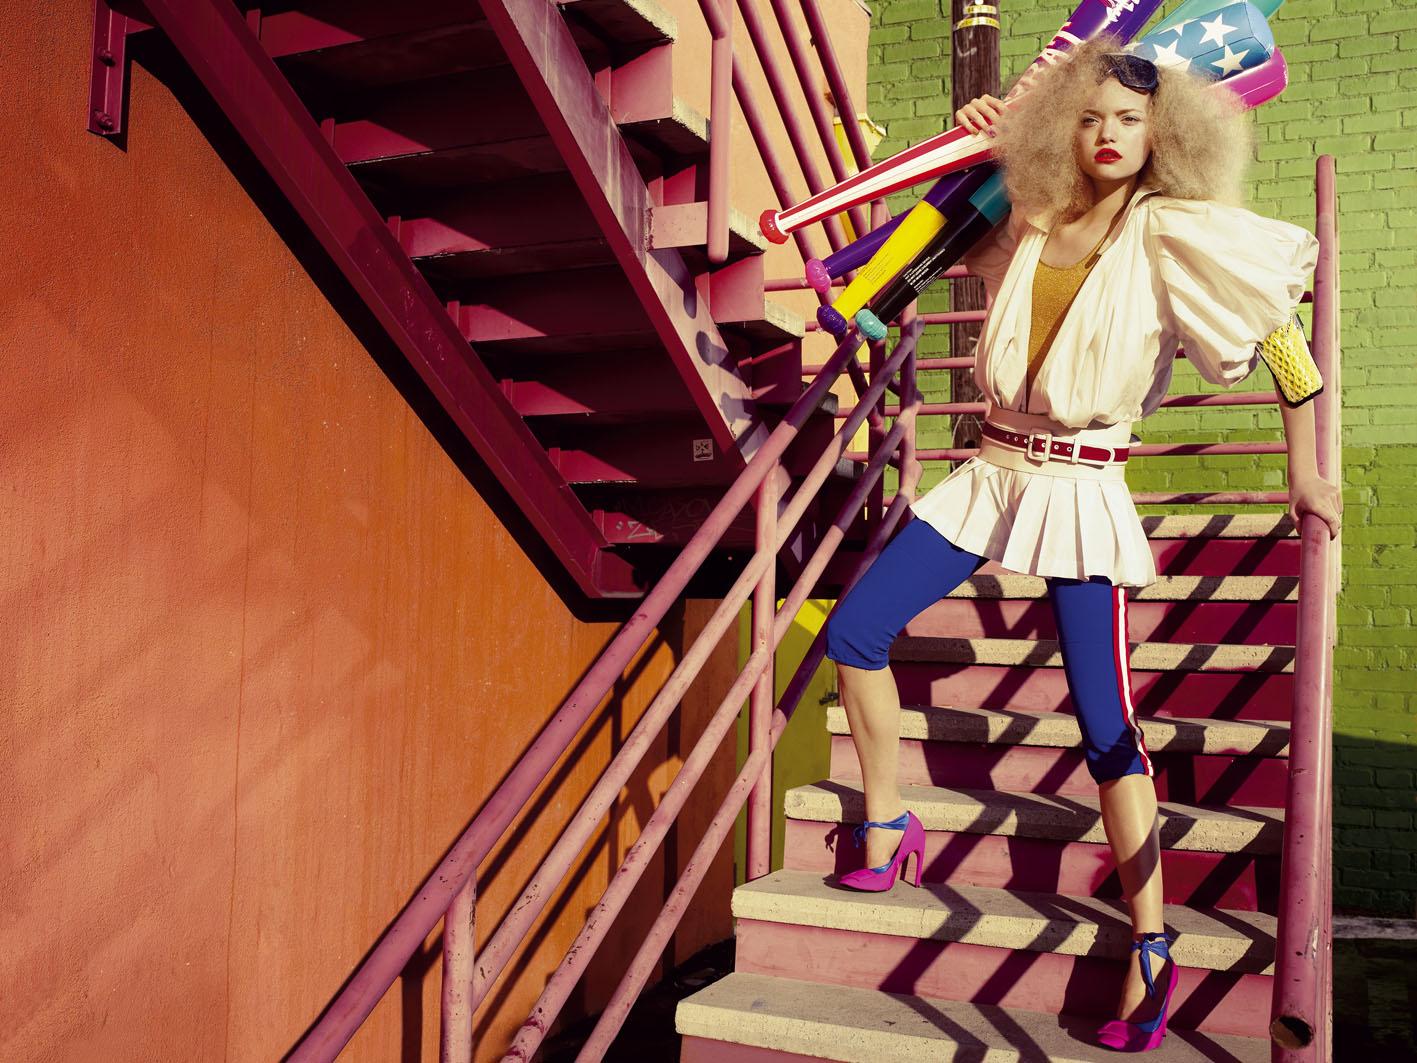 http://2.bp.blogspot.com/_mf2NYHWGS3s/TBAlj_to5QI/AAAAAAAAJfA/O_HdtFVcyI0/s1600/Gemma+Ward+by+Mario+Testino+(Good+Sport+-+Vogue+UK+April+2006).jpg